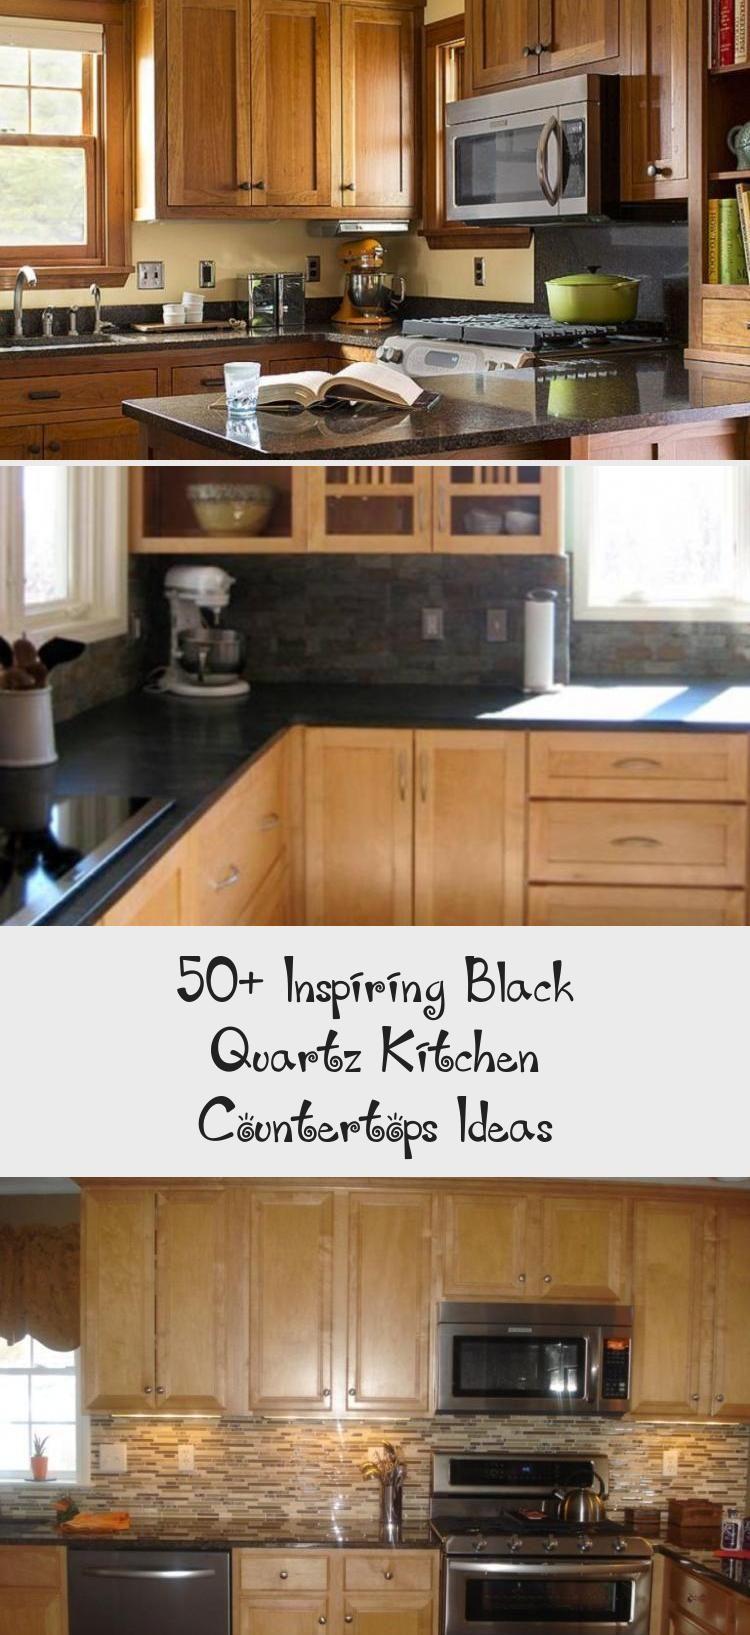 50 inspiring black quartz kitchen countertops ideas quartz kitchen countertops kitchen on kitchen decor black countertop id=26372